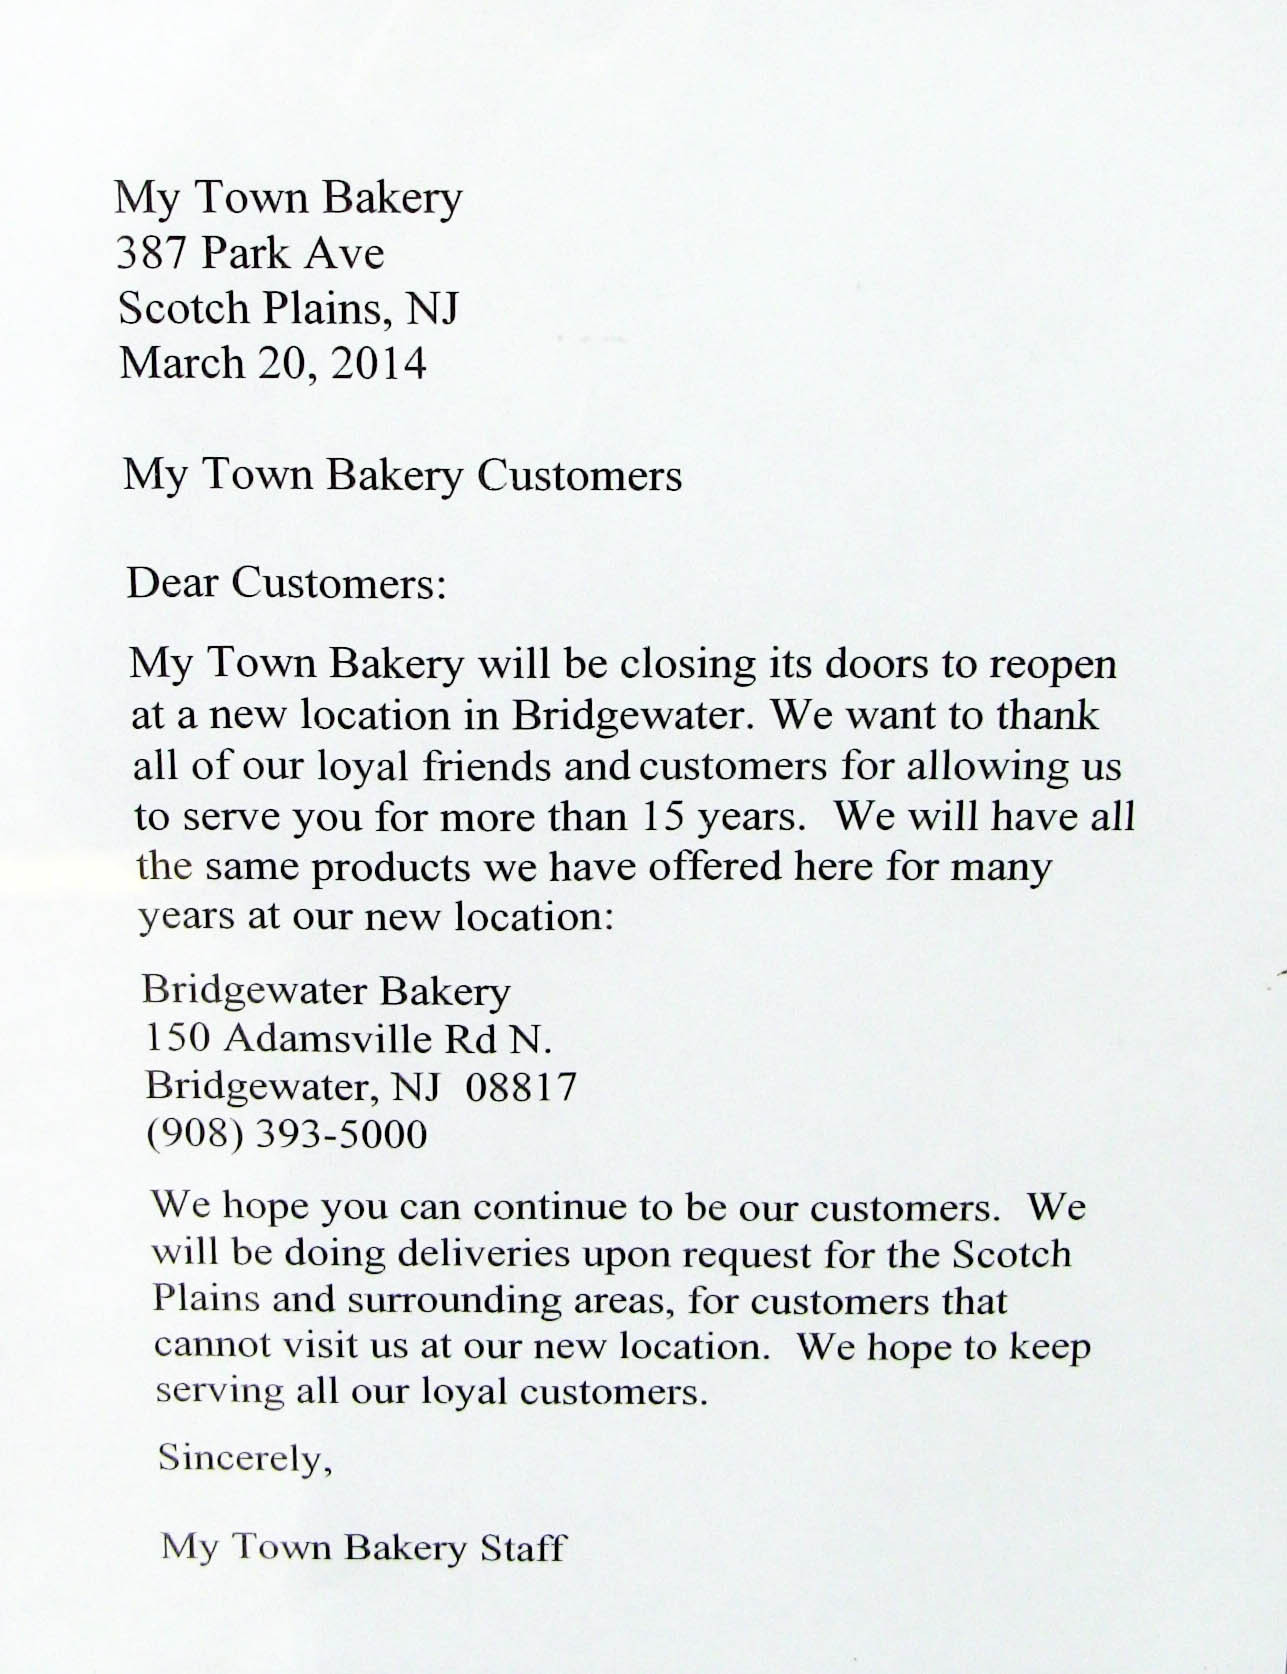 2e8b9fc0184f153f8894_My_Town_Bakery_Letter_3-25-14.jpg